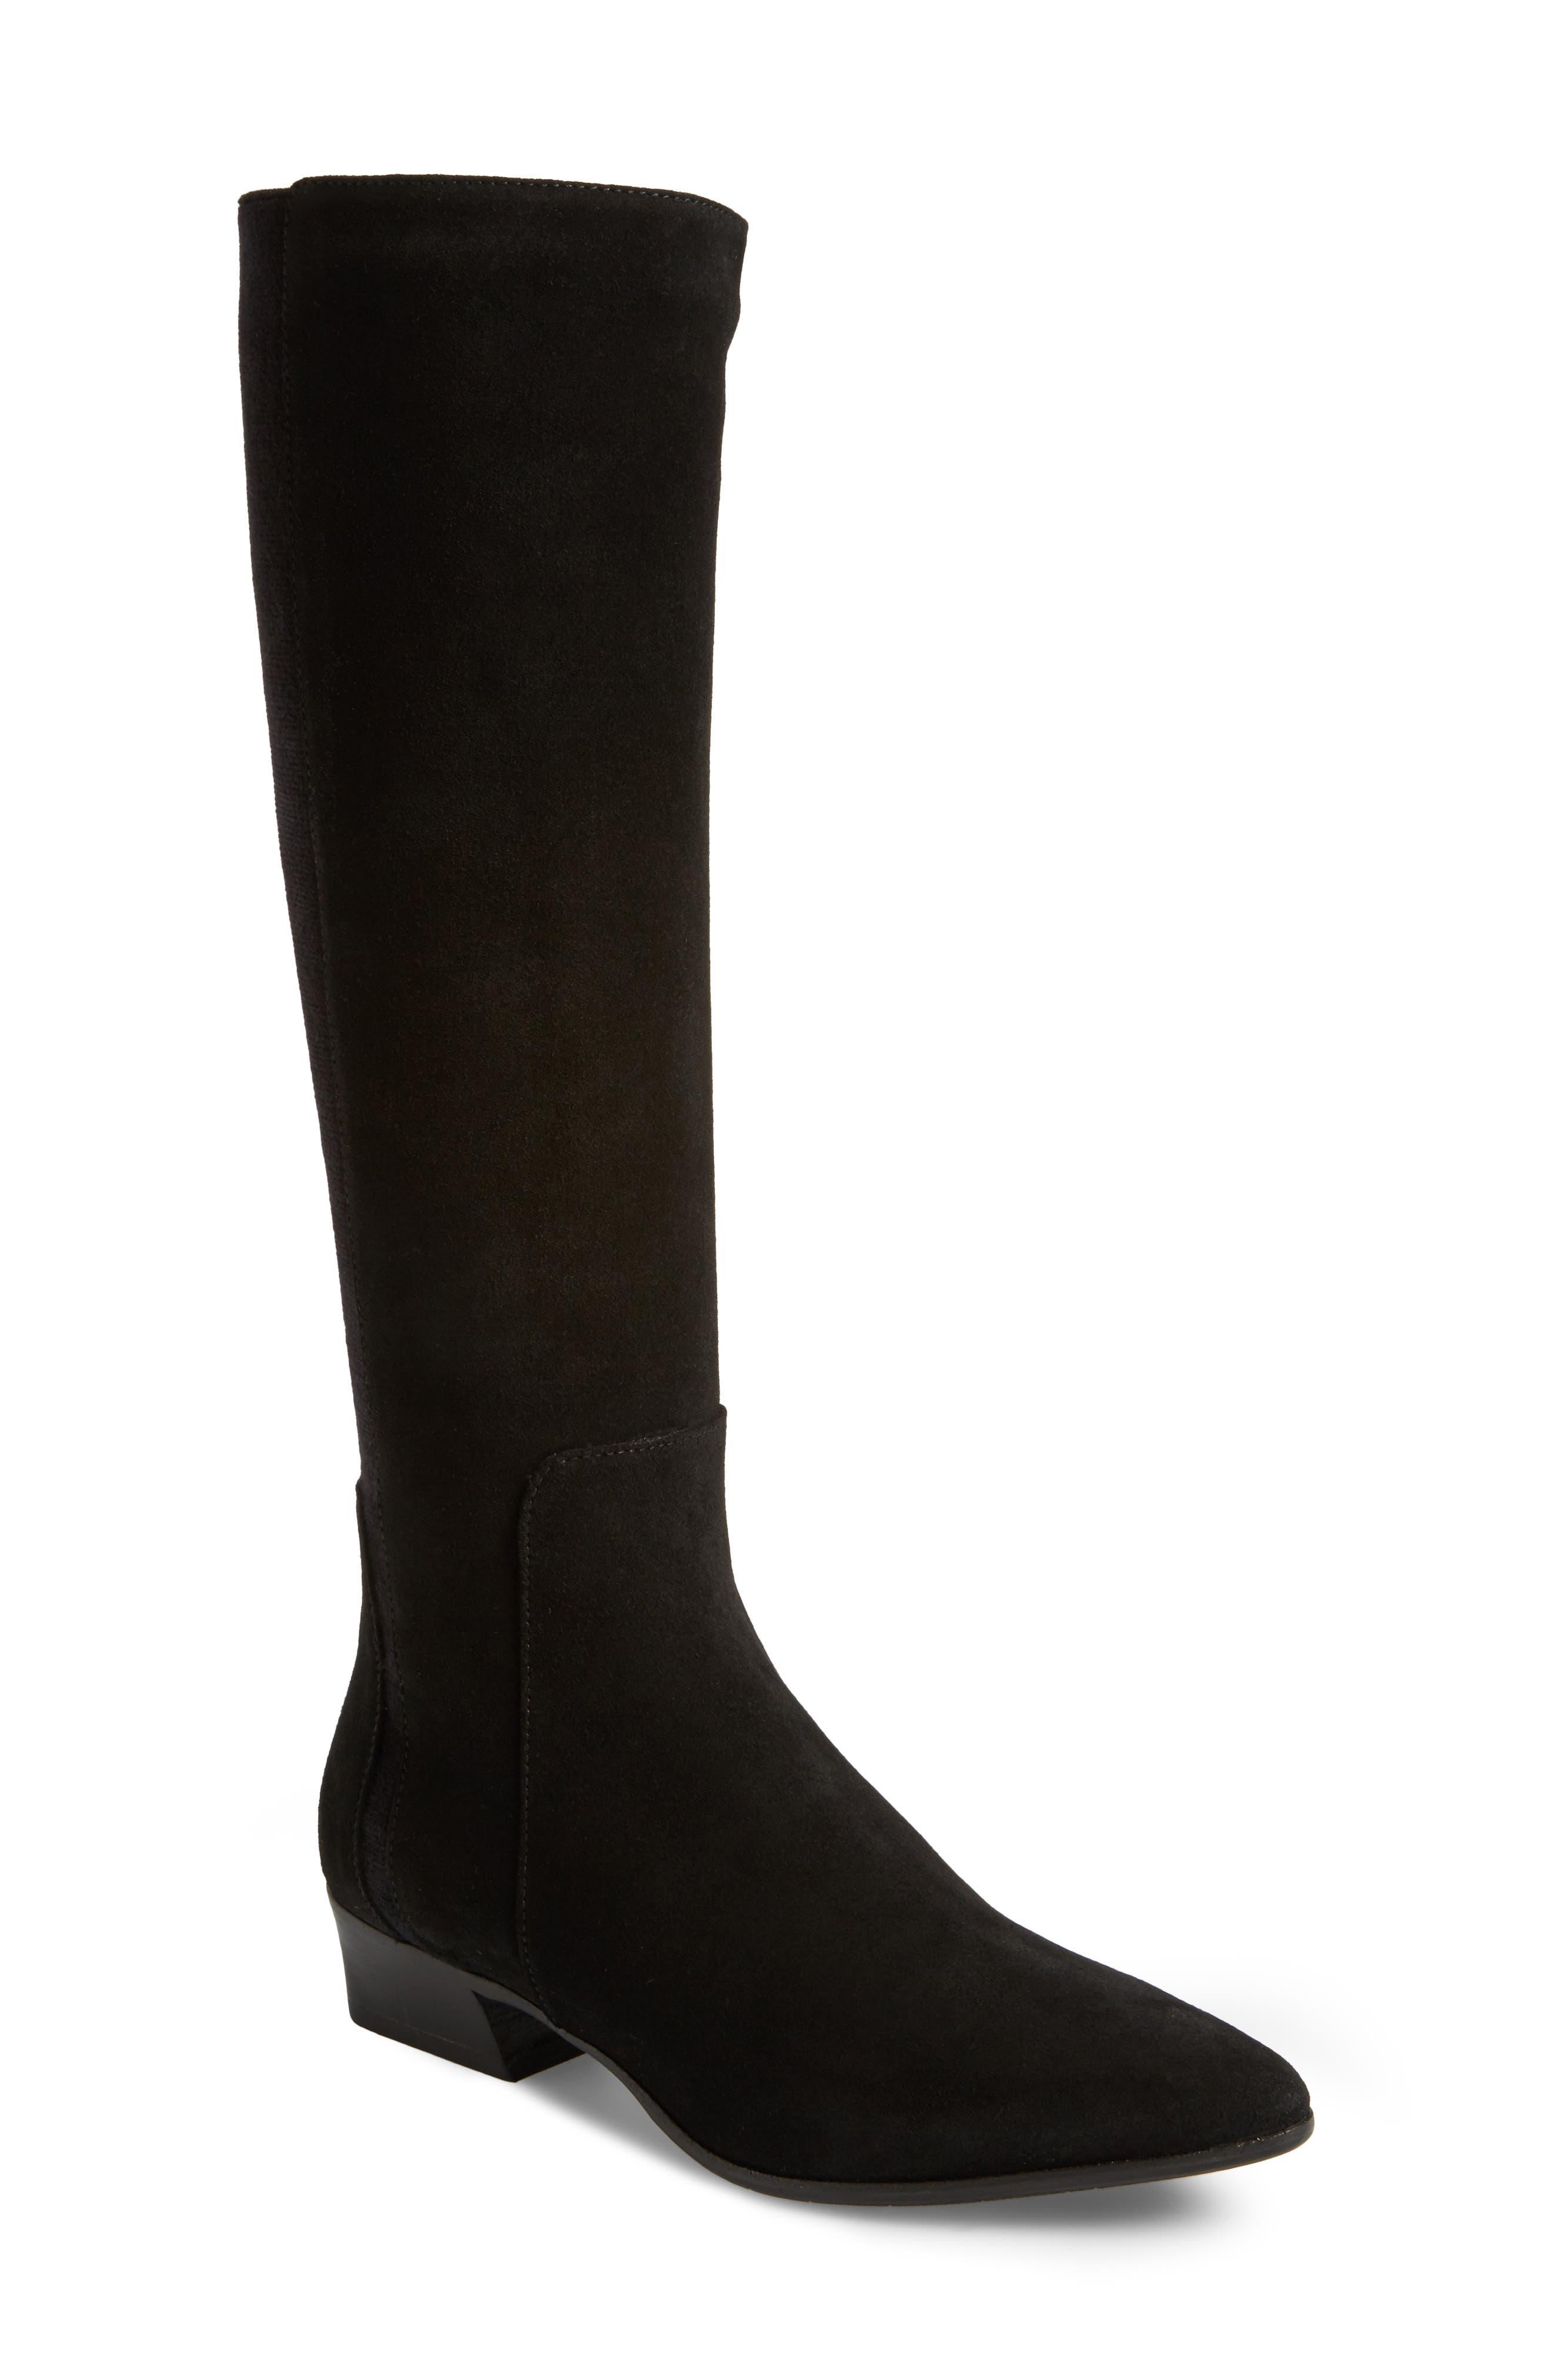 Federica Weatherproof Knee High Boot,                             Main thumbnail 1, color,                             Black Suede